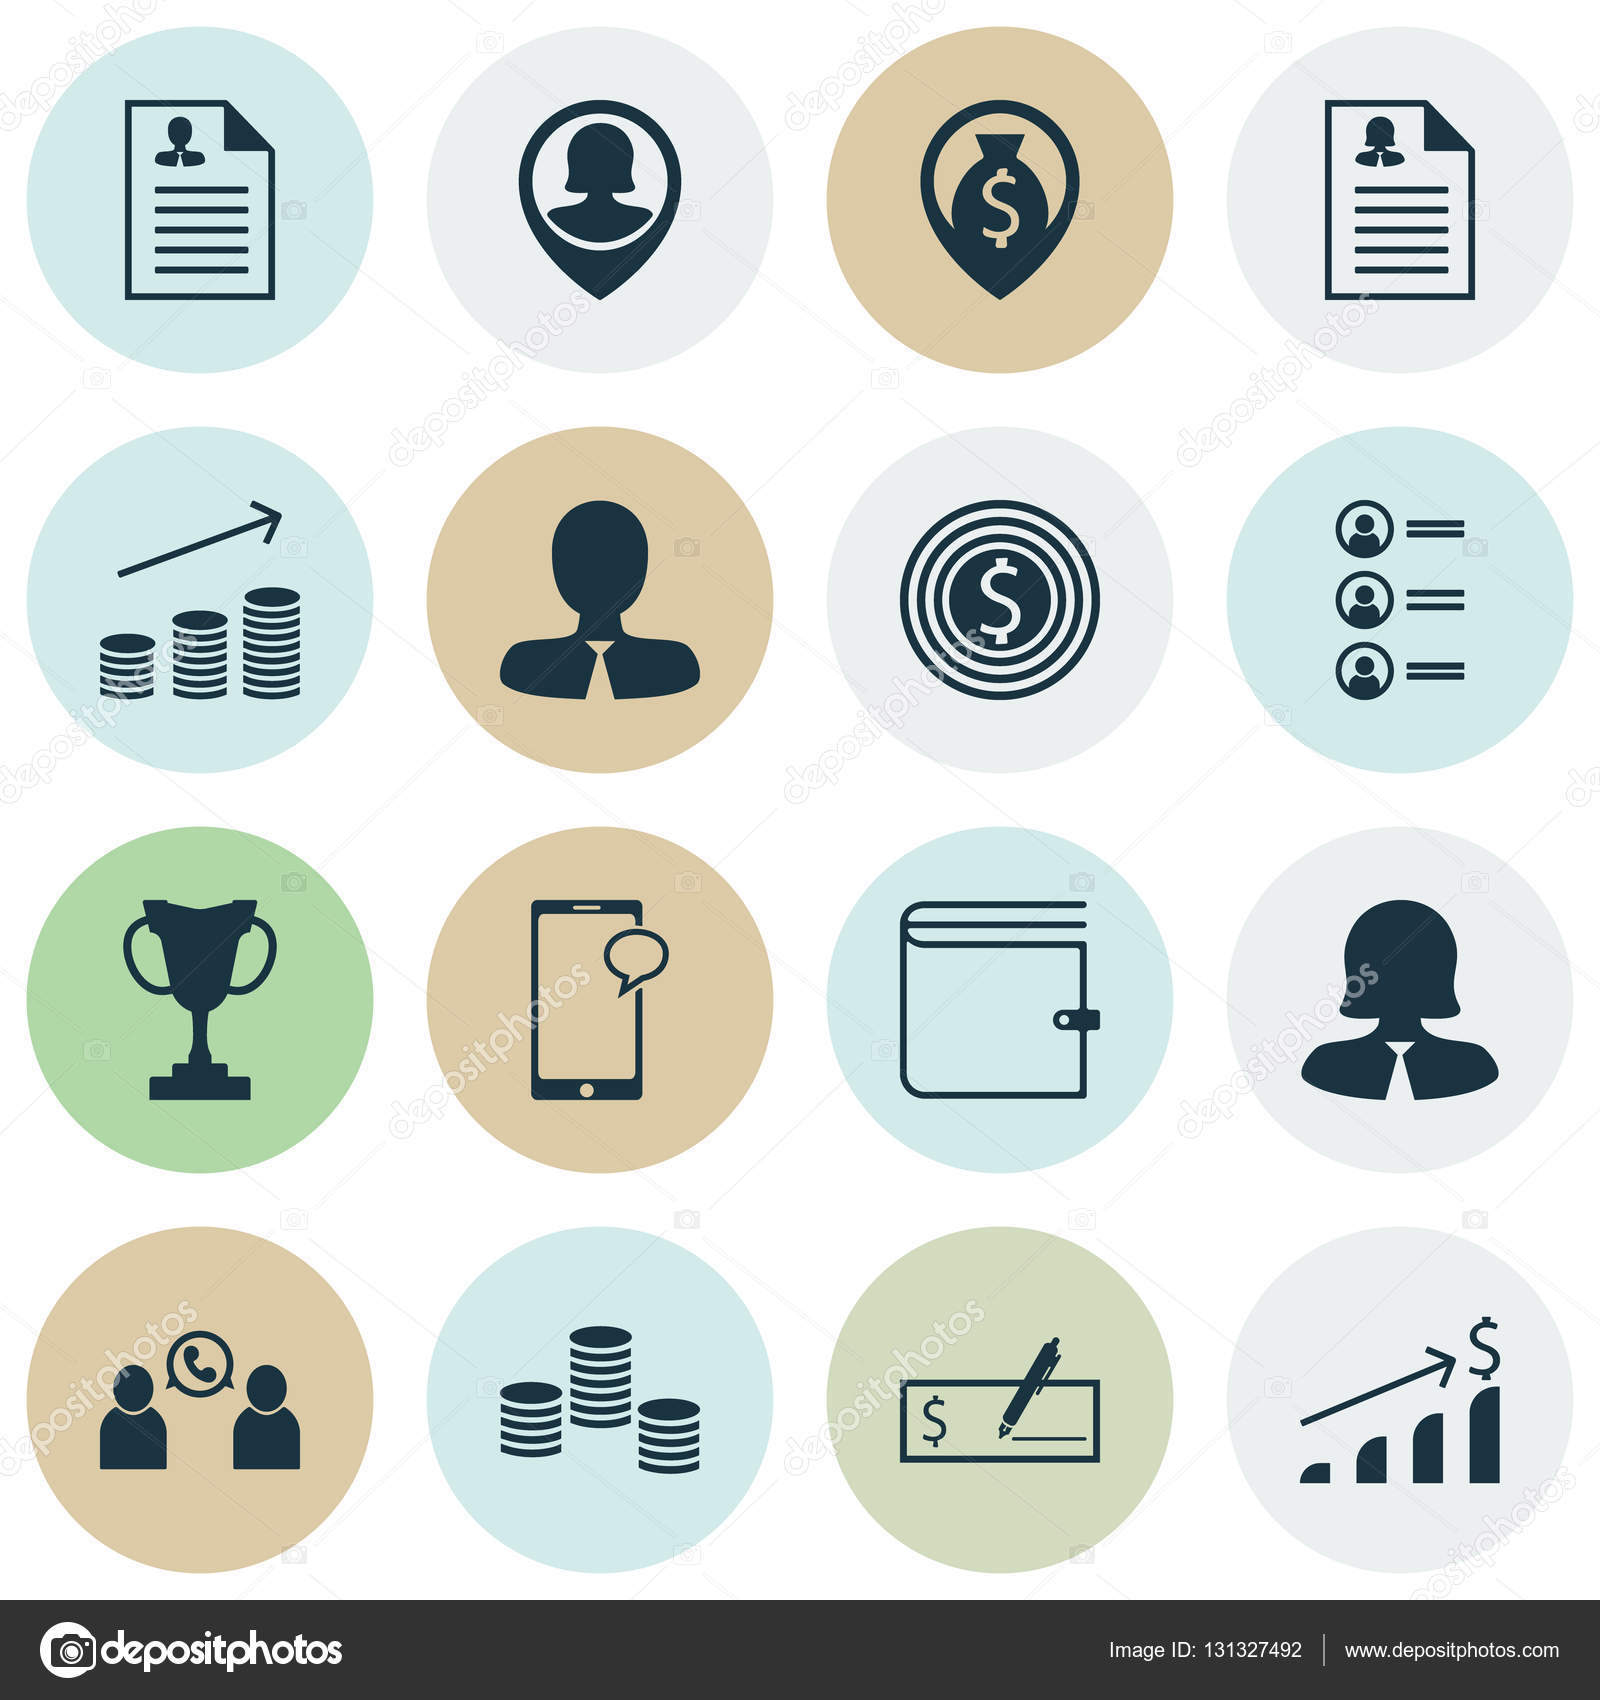 051a89fea9e5f Conjunto de iconos de recursos humanos en currículum